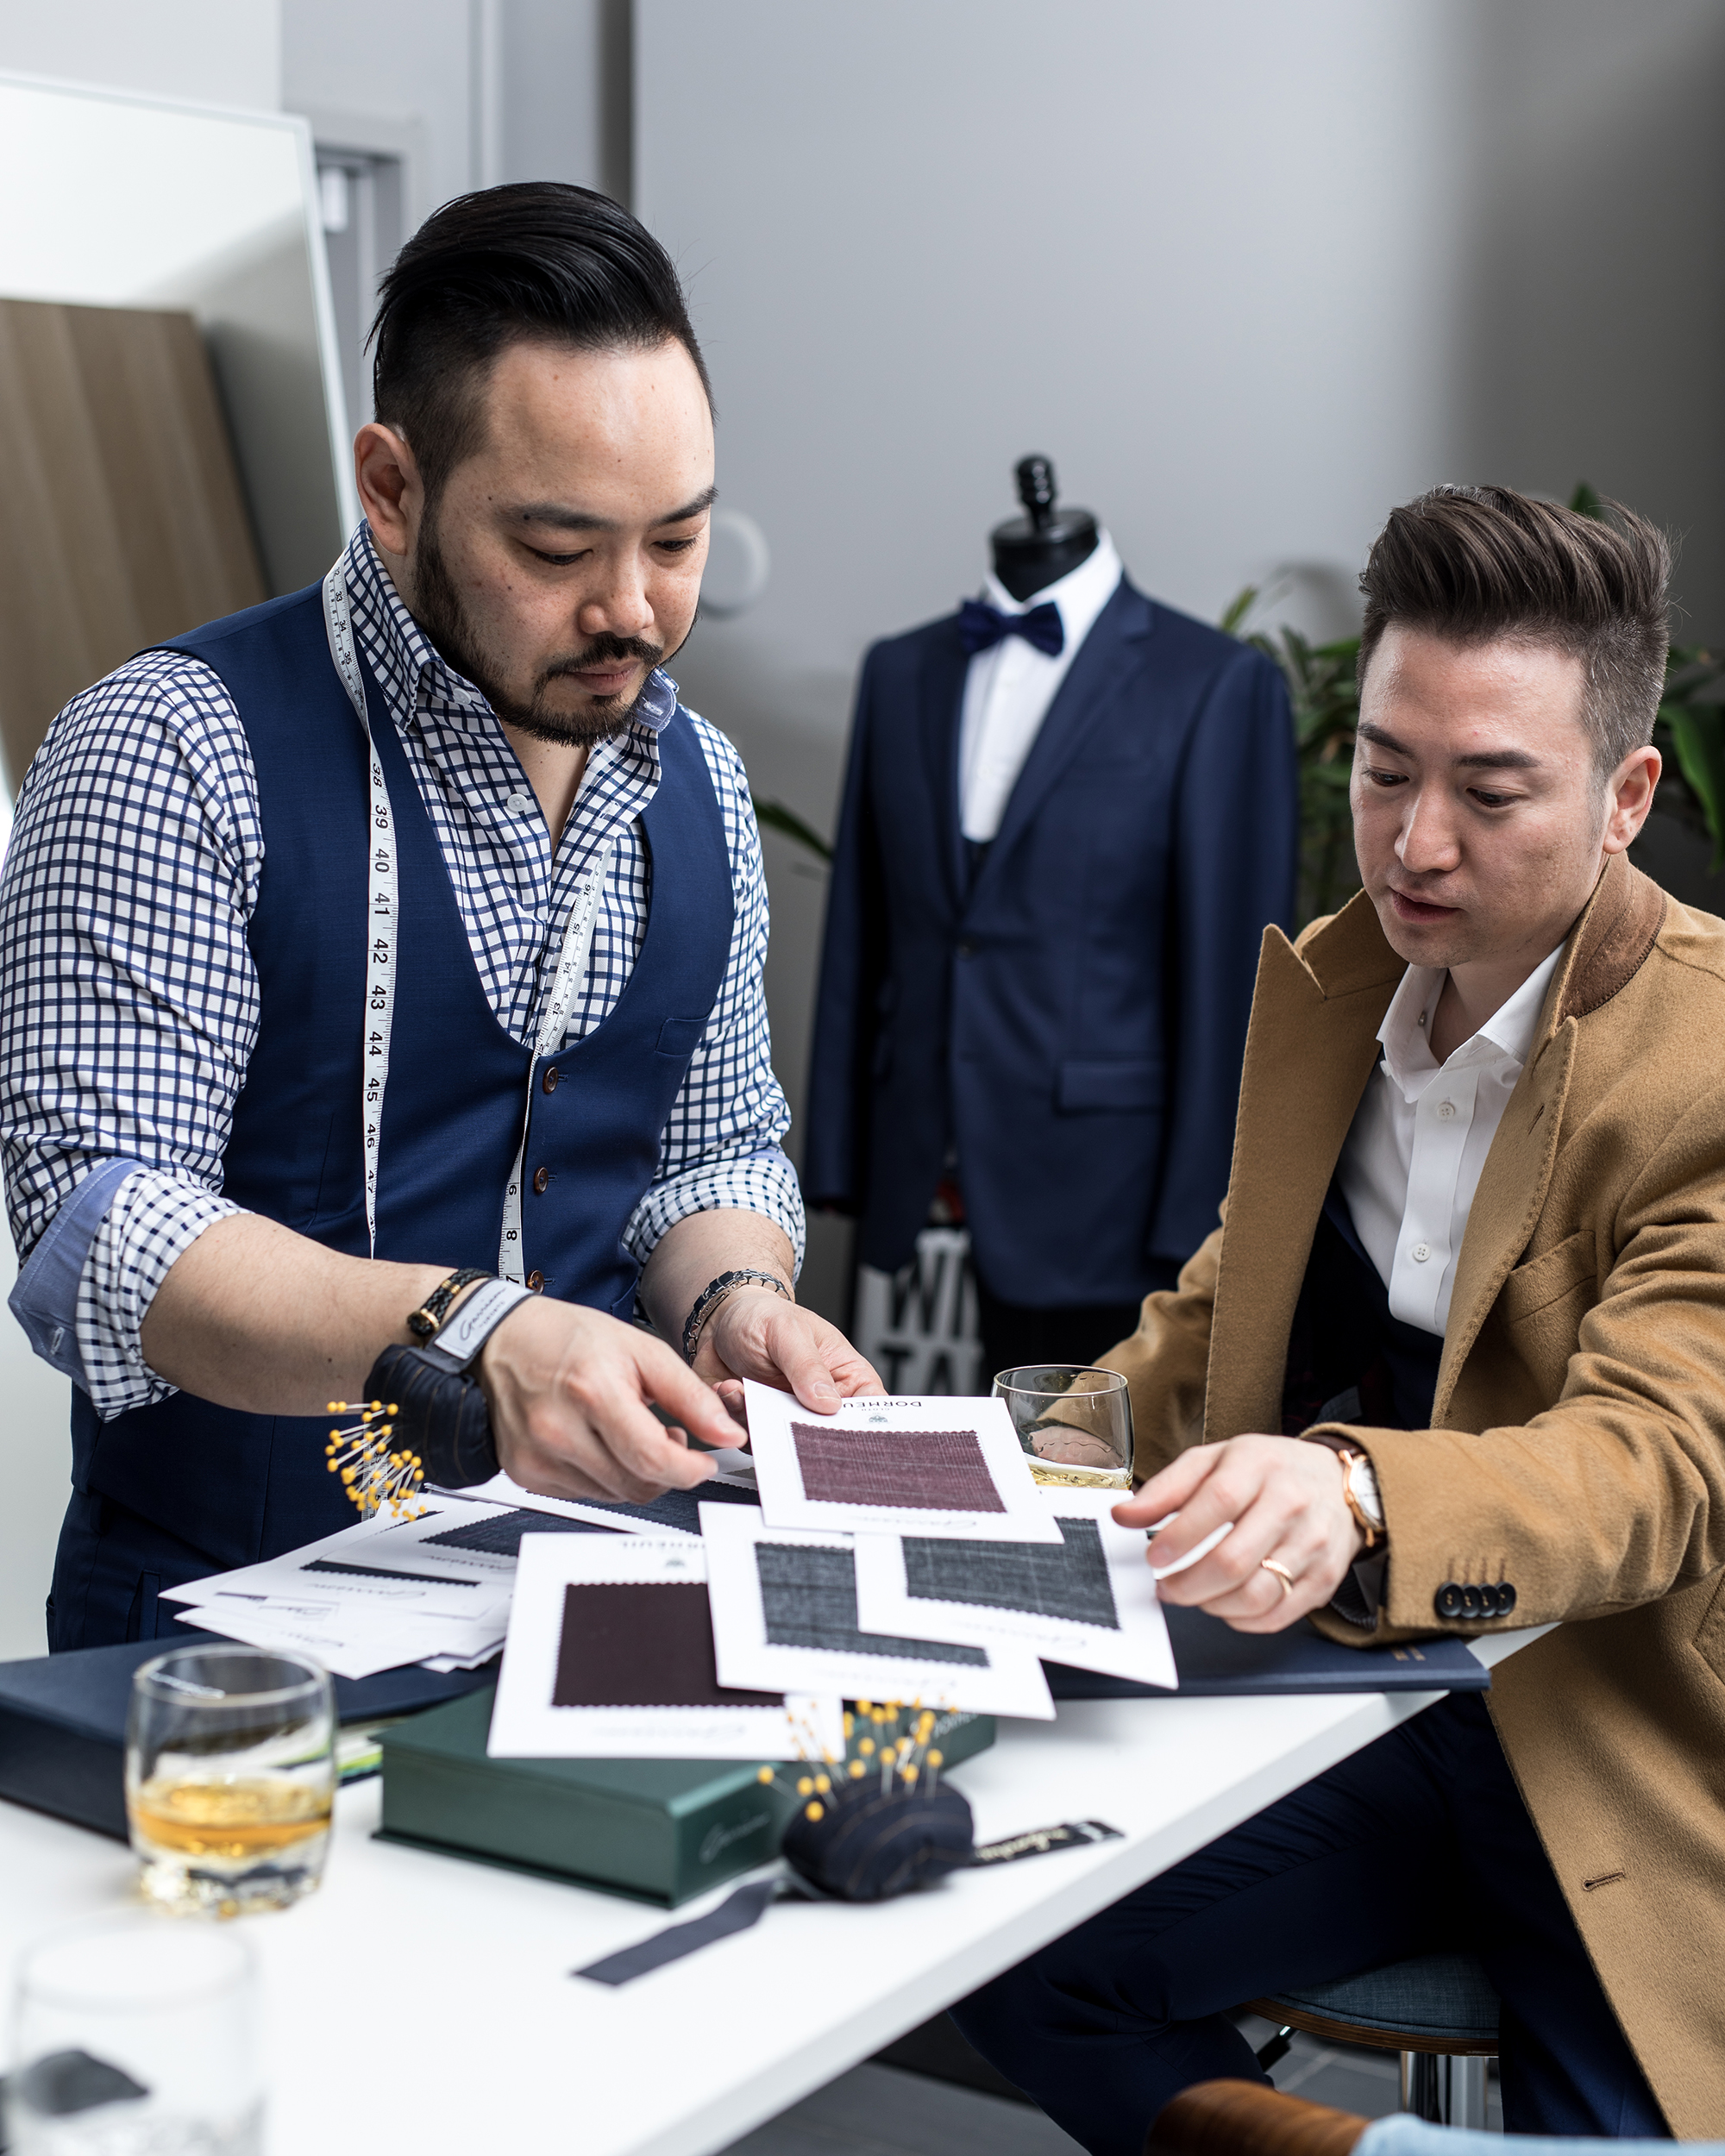 Bepoke-custom-suit-fabric-consult.jpg